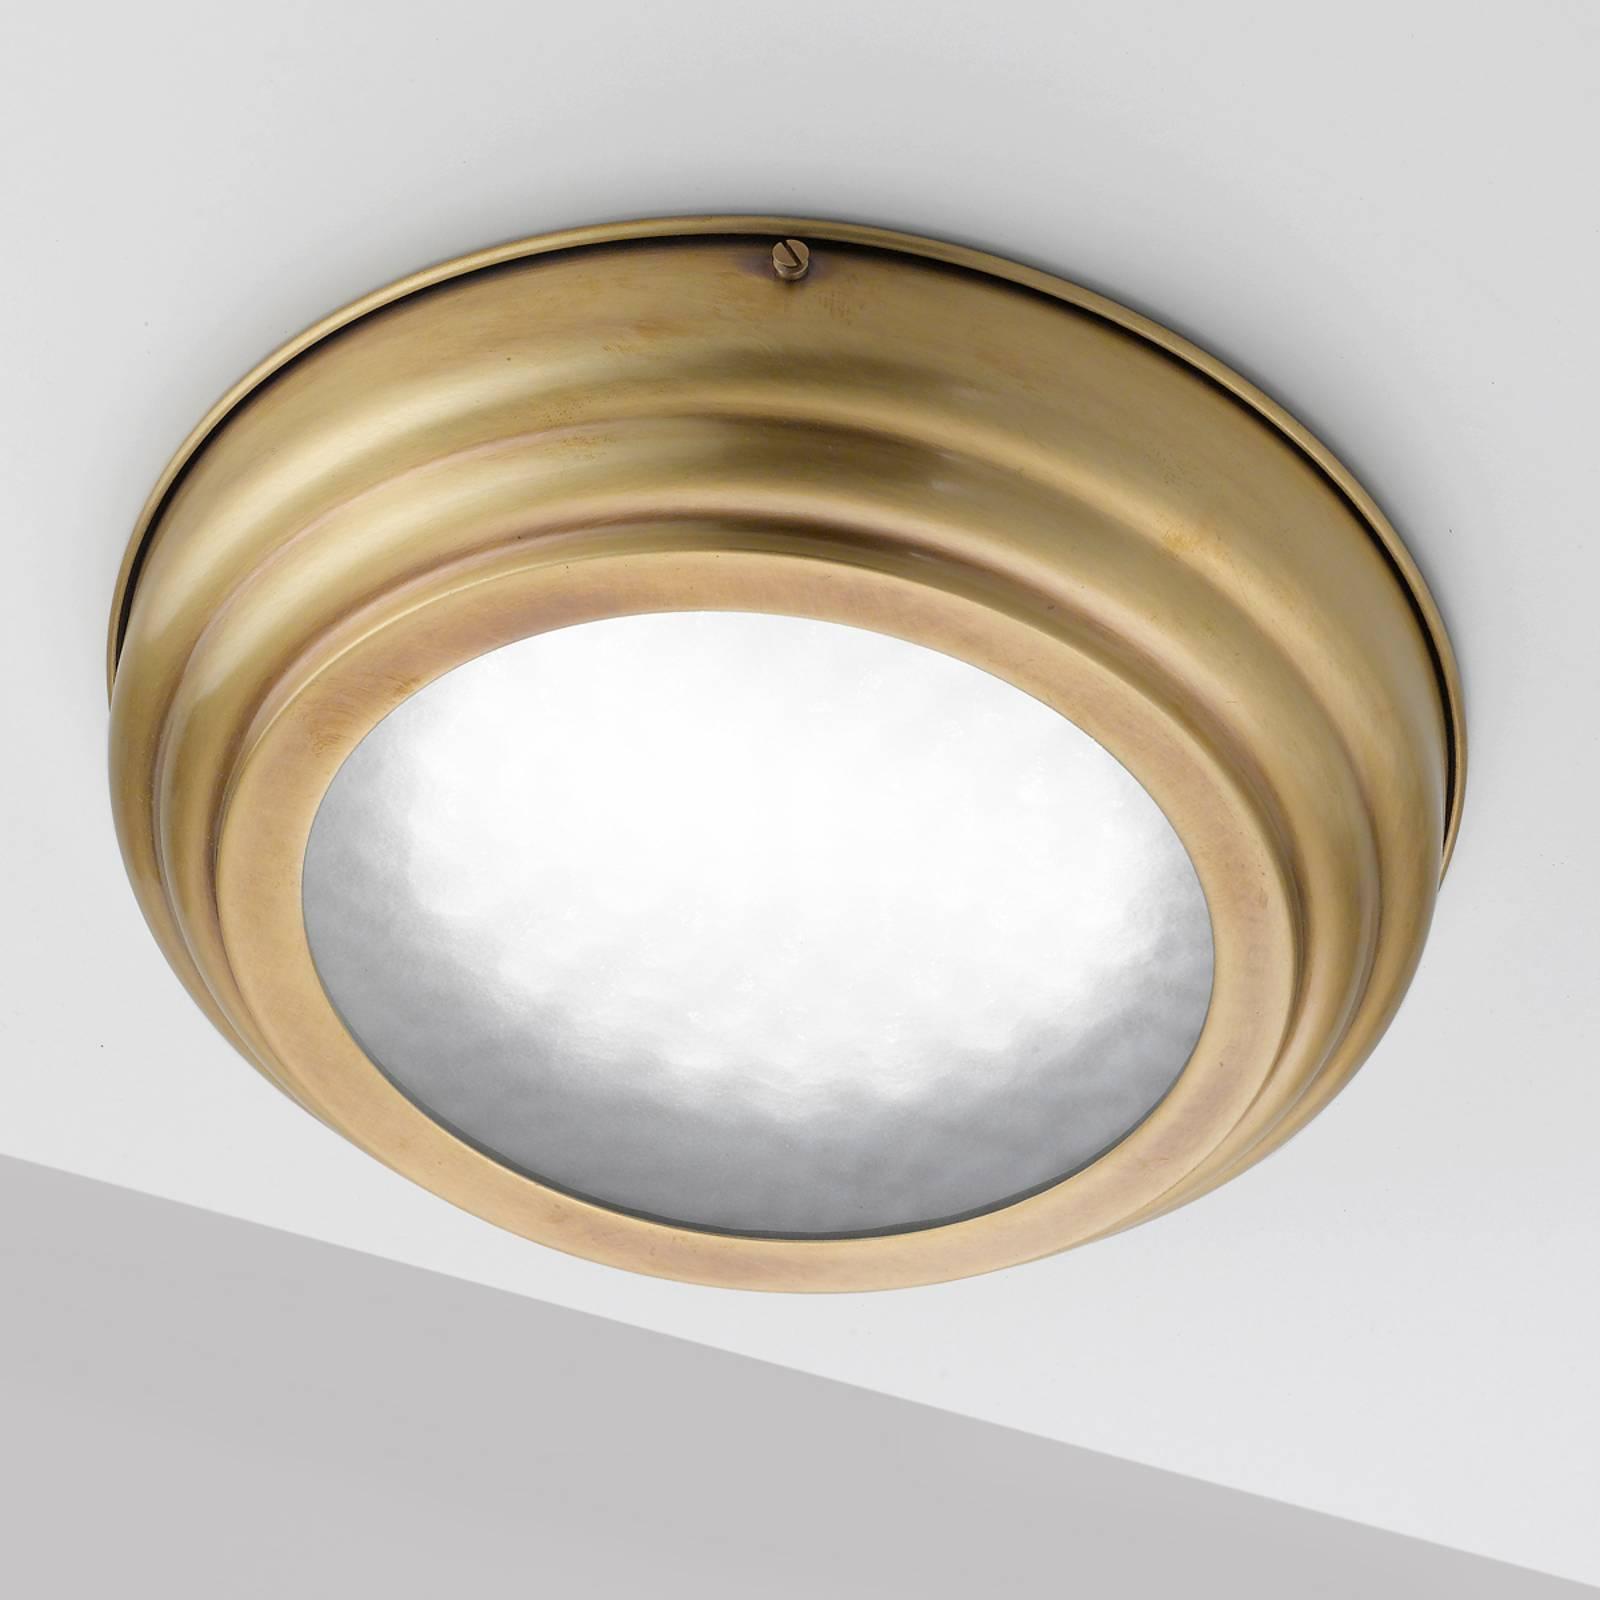 Lampa sufitowa LED Scirocco 39cm, mosiądz